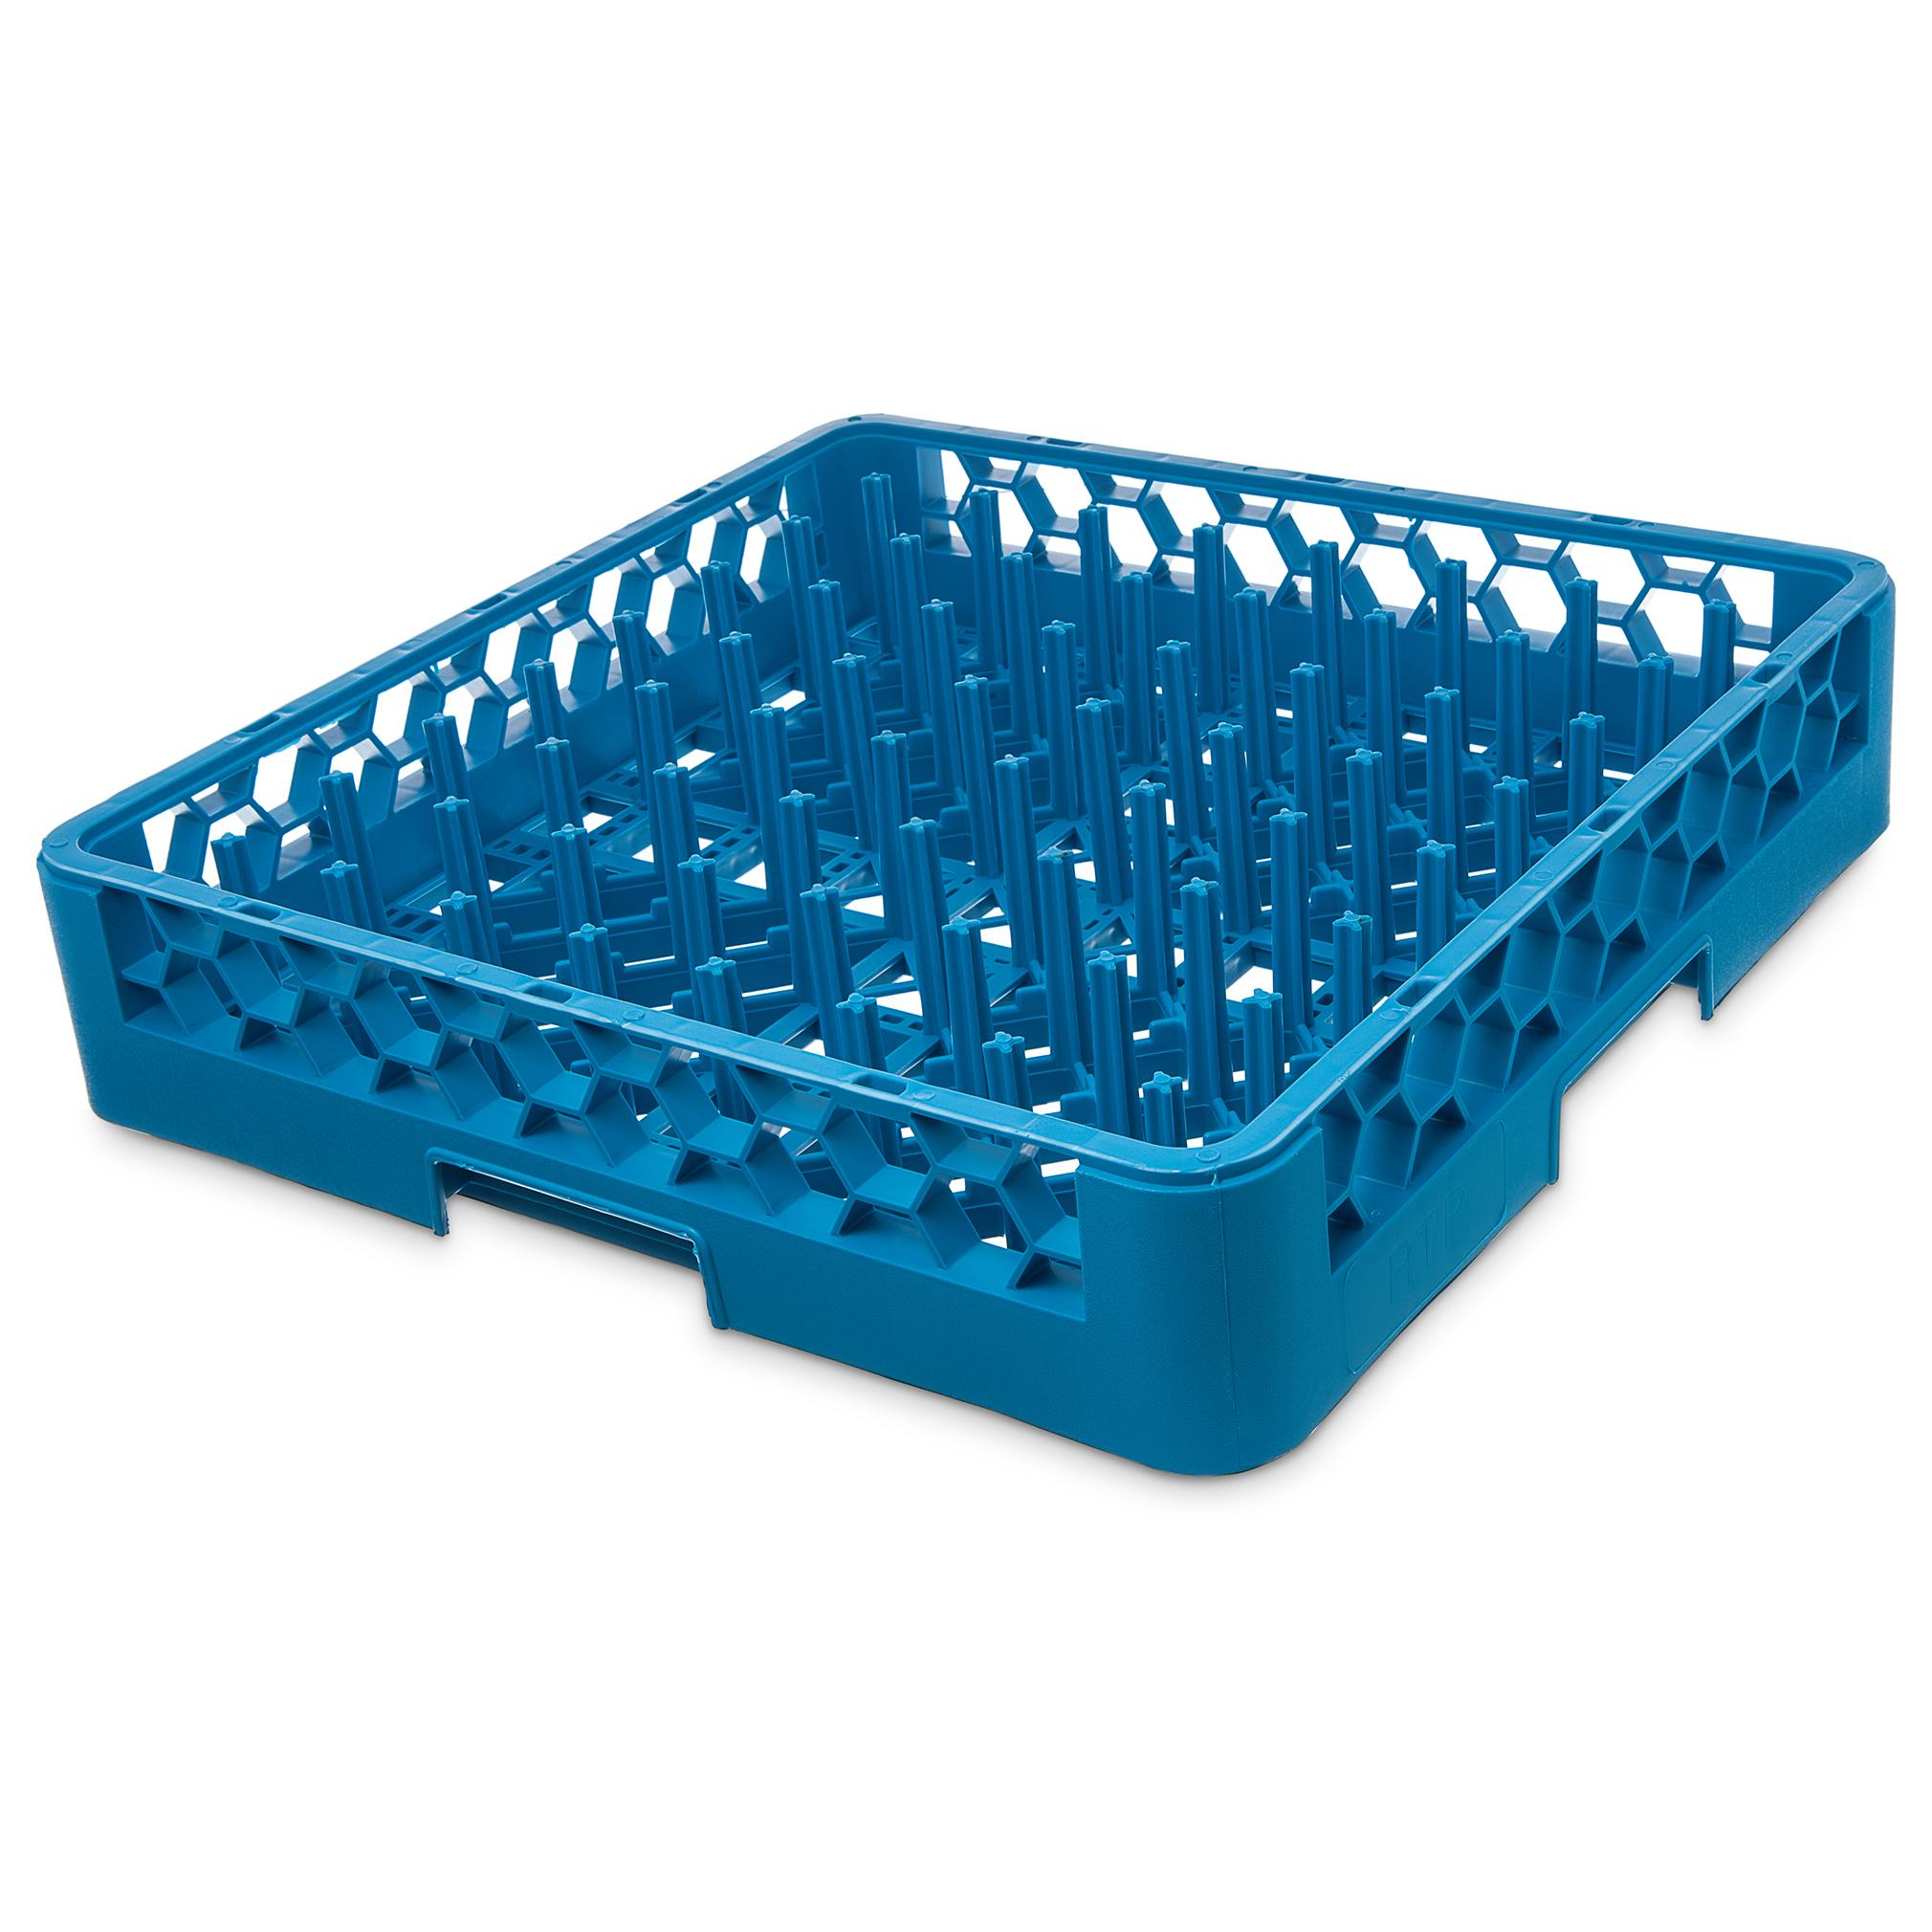 OptiClean? All Purpose Dishwasher Peg Rack Carlisle RP14